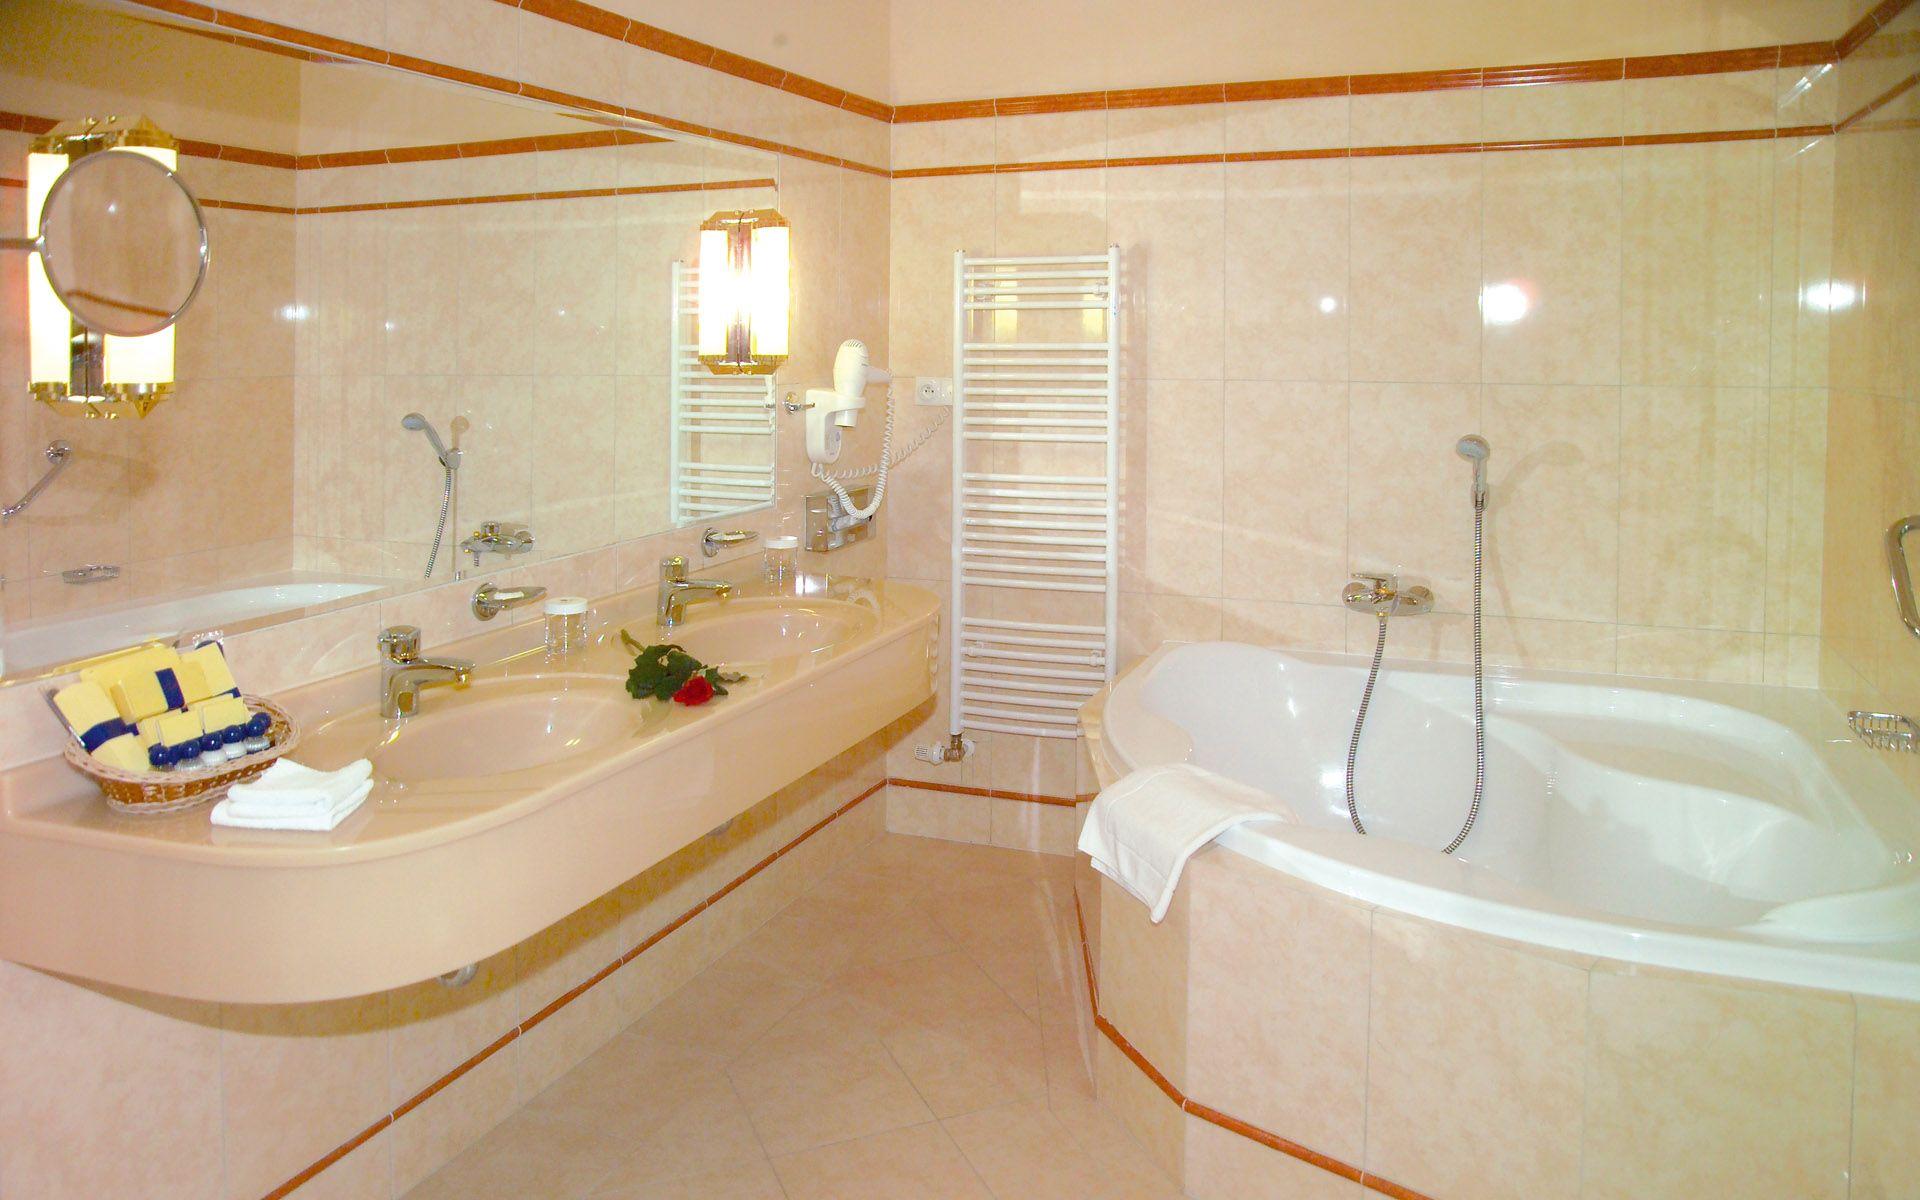 Bathroom indoor jacuzzi redlines bathroom ideas for Bathroom jacuzzi ideas